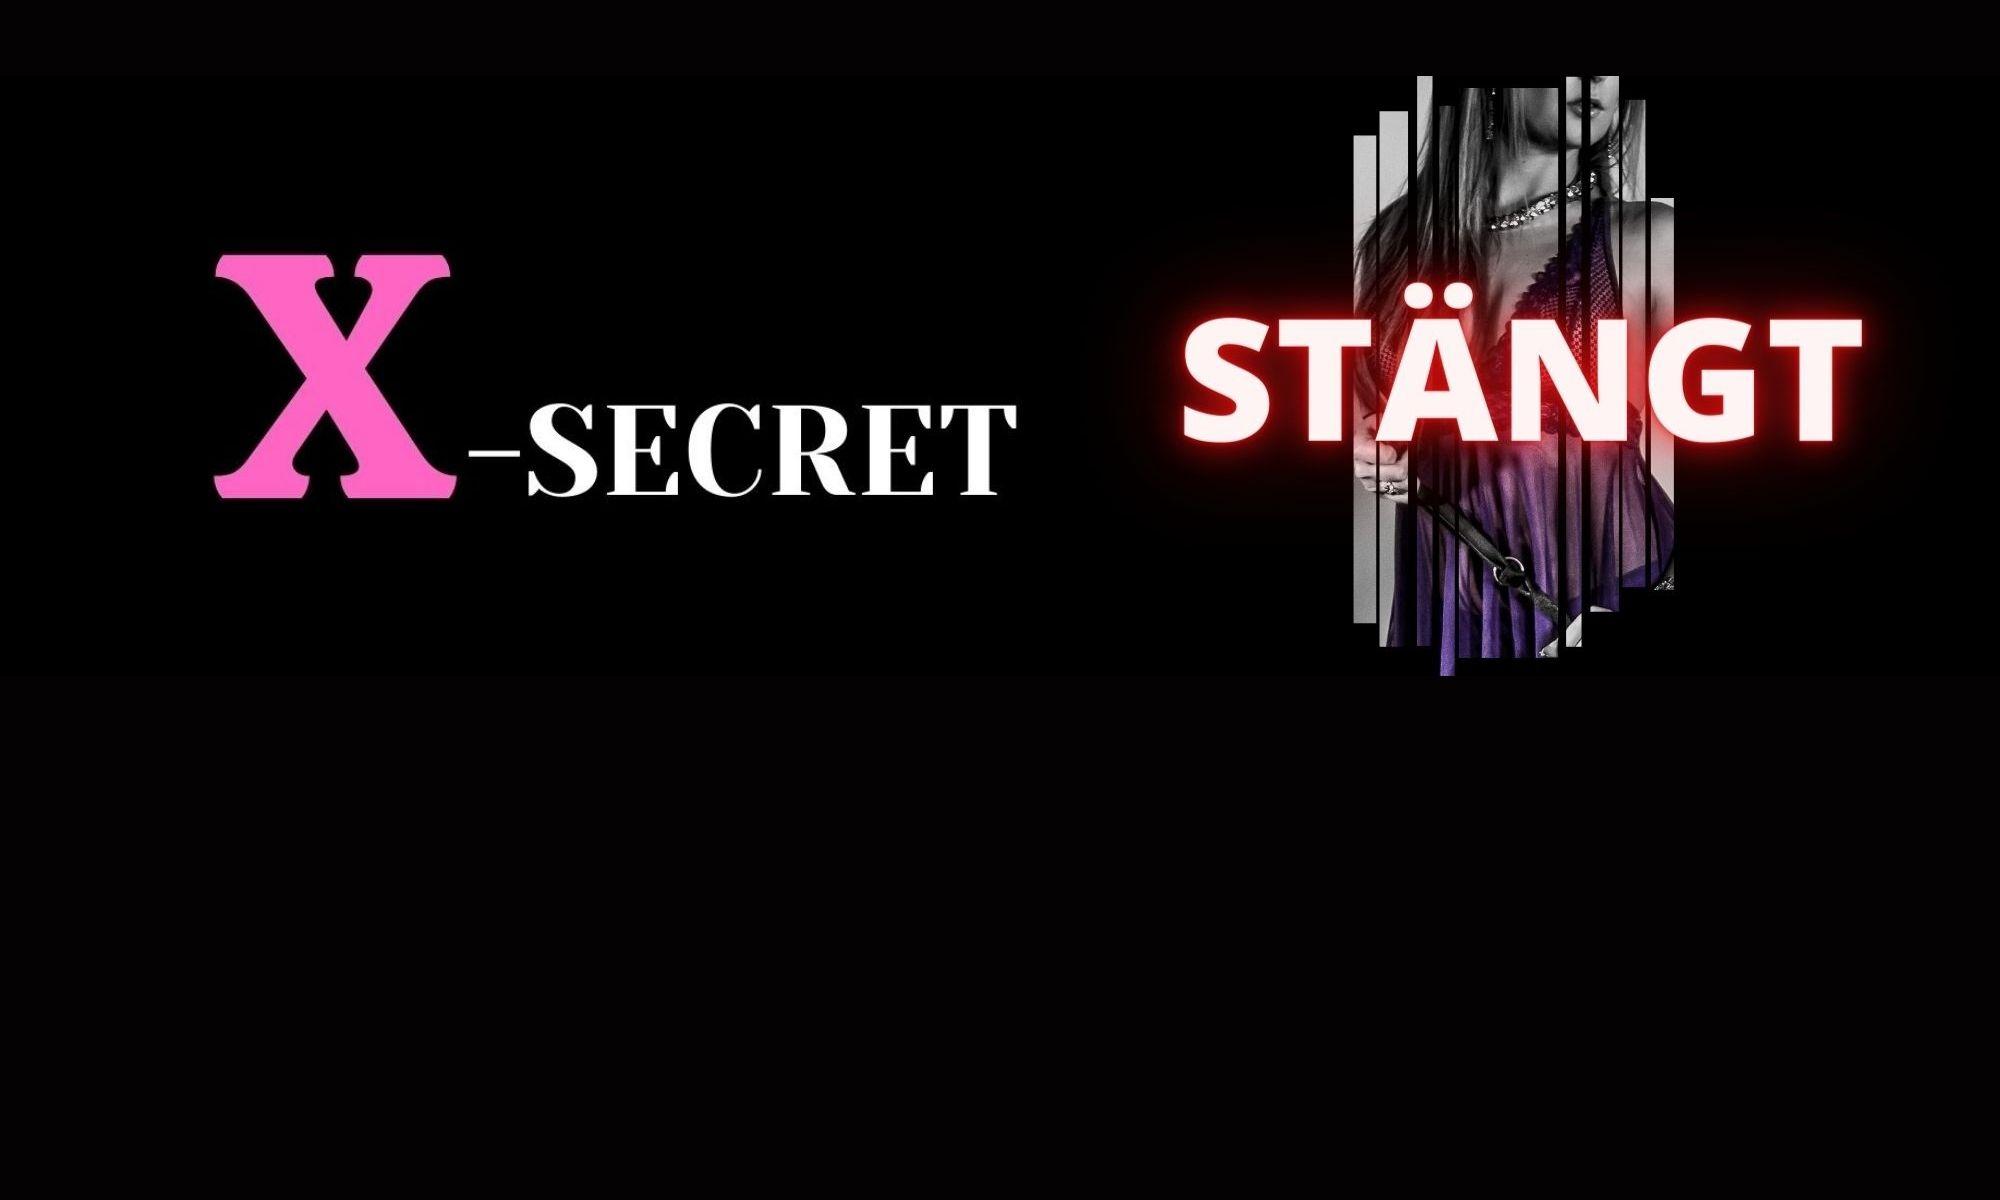 X-secret